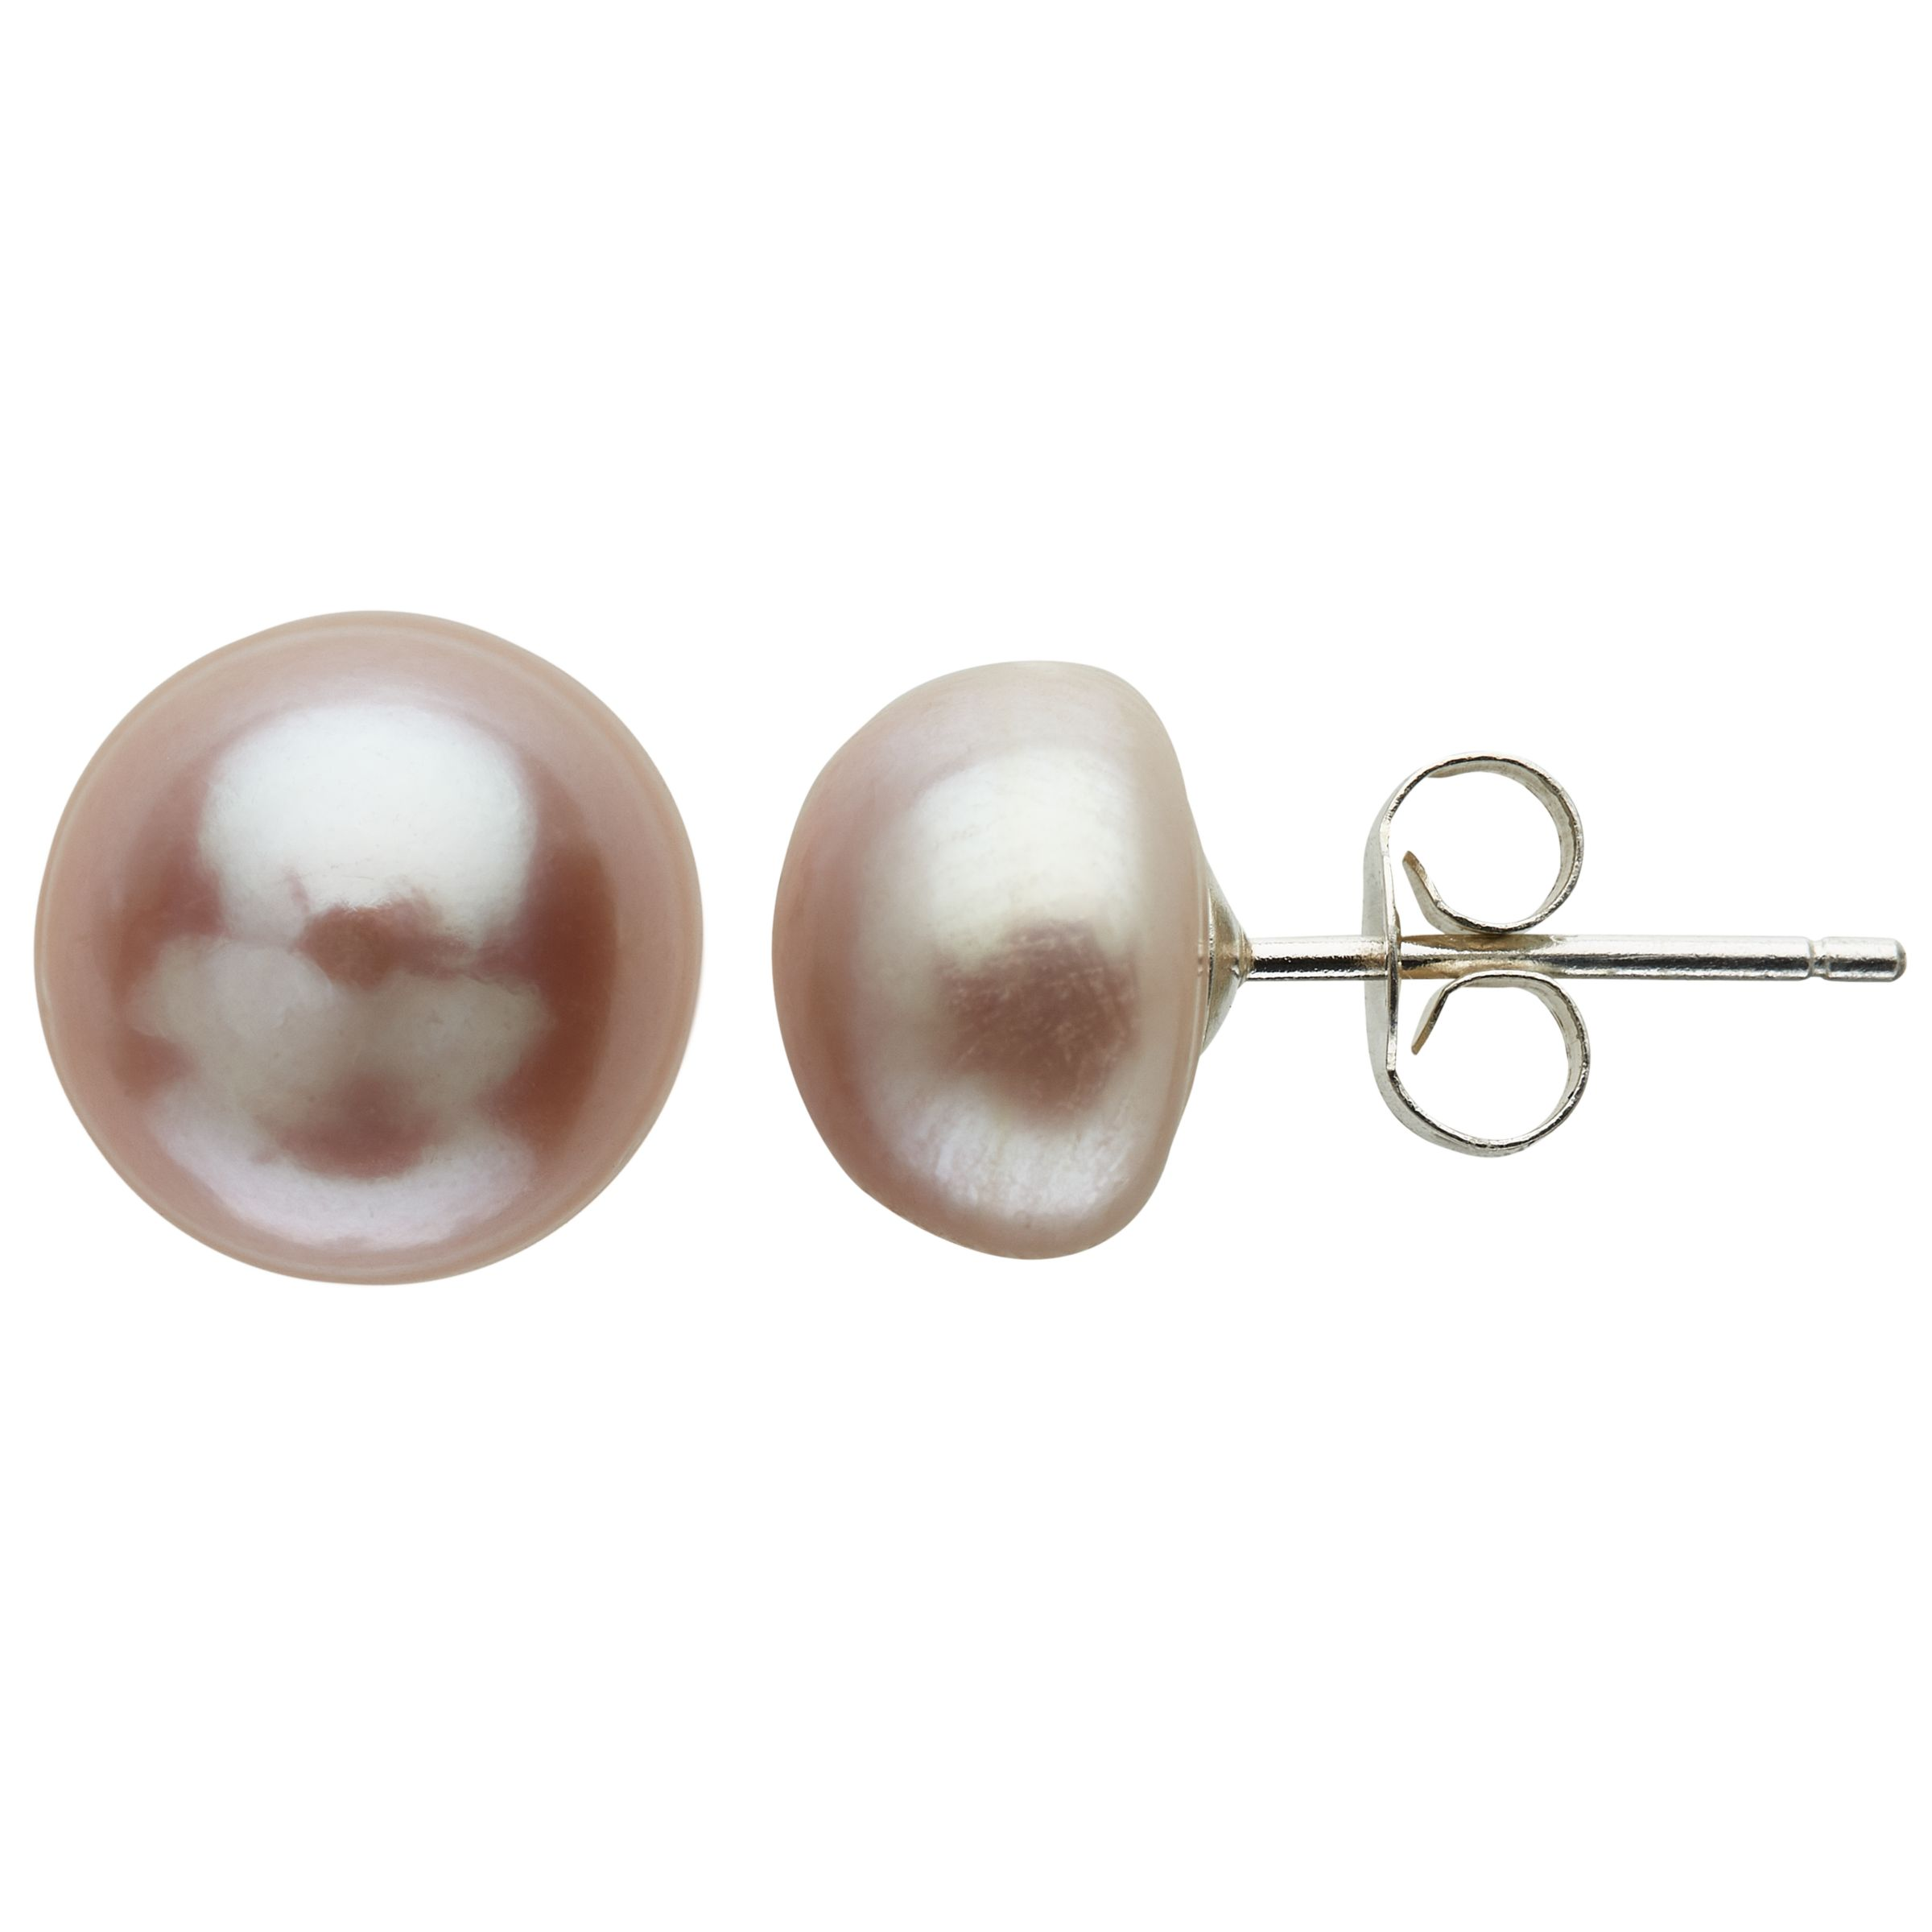 Claudia Bradby Claudia Bradby Freshwater Pearl Button Stud Earrings, 9-10mm